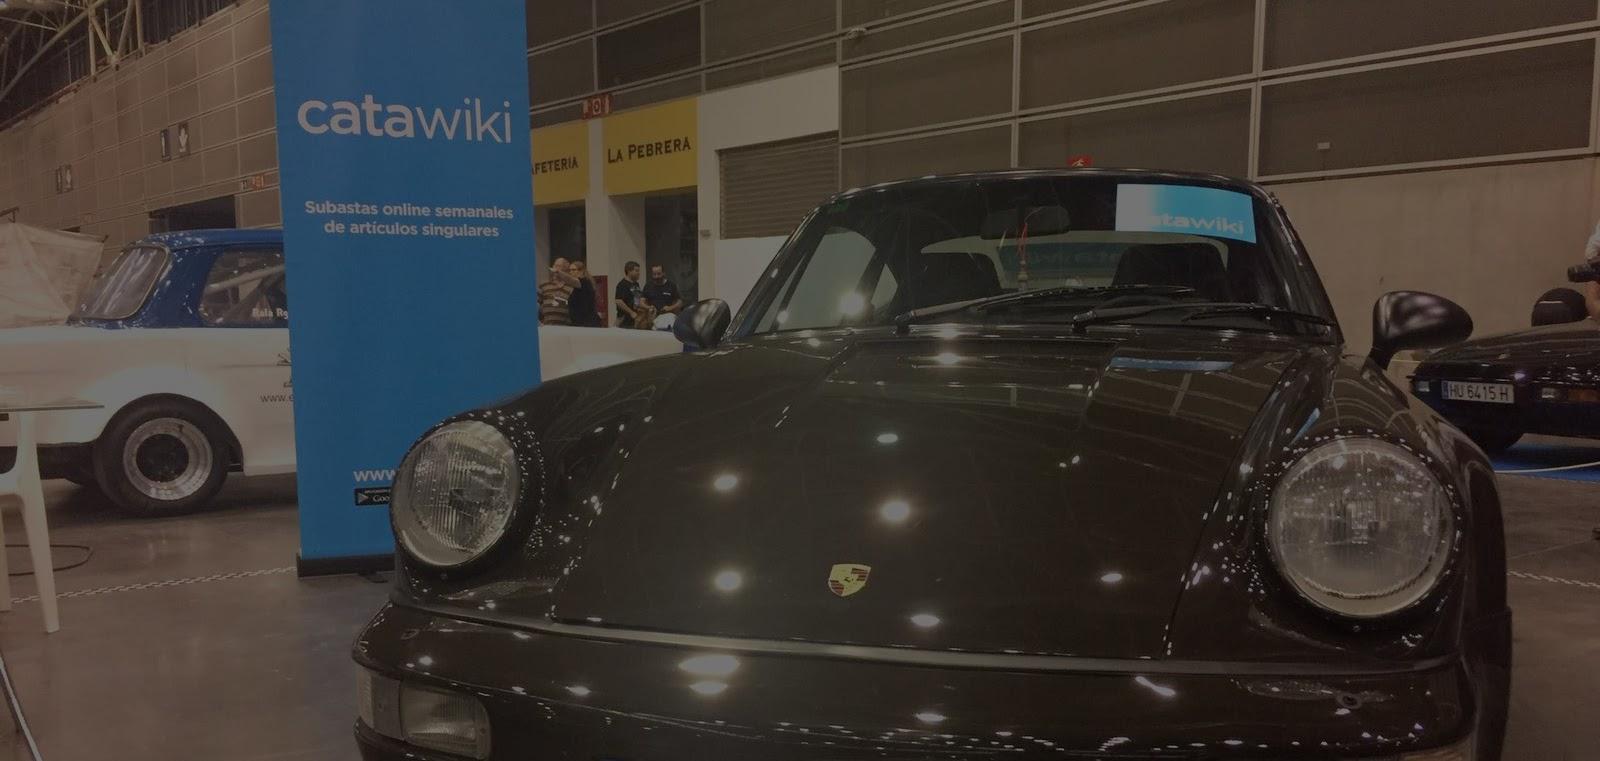 Catawiki luce material corporativo en la feria del Automóvil Clásico